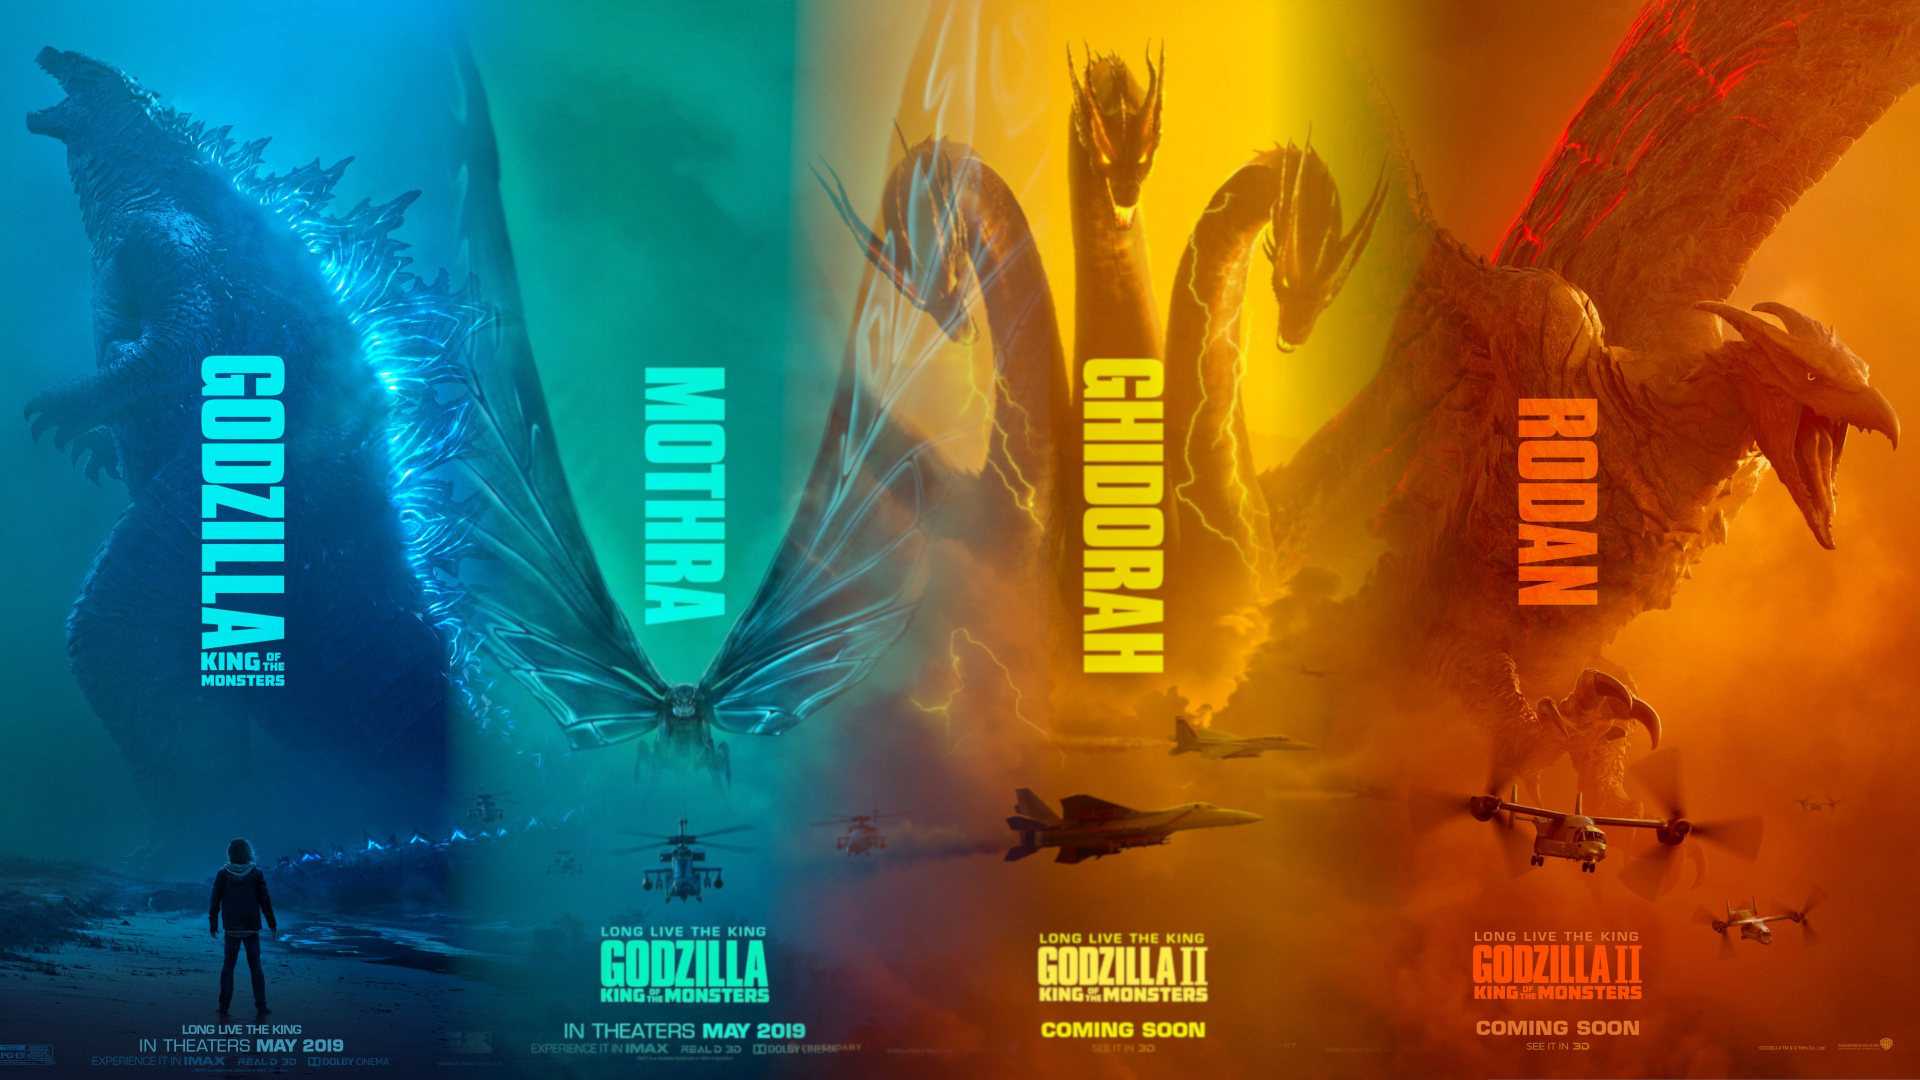 Godzilla Ii King Of The Monsters Wallpaper By Djmc777 On Deviantart